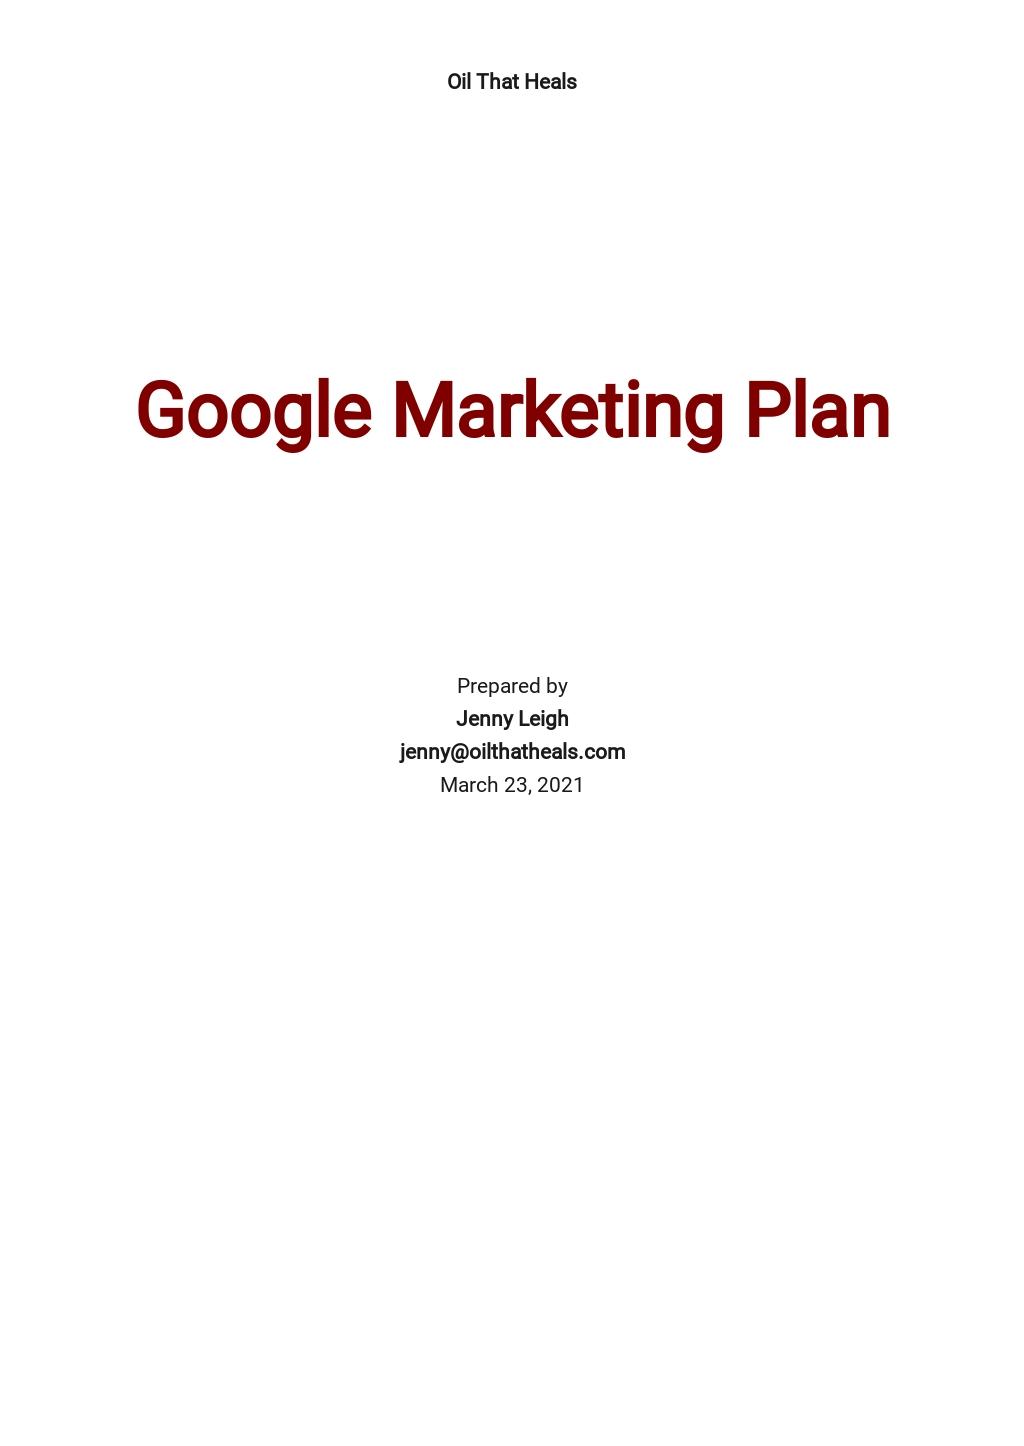 Google Marketing Plan Template.jpe